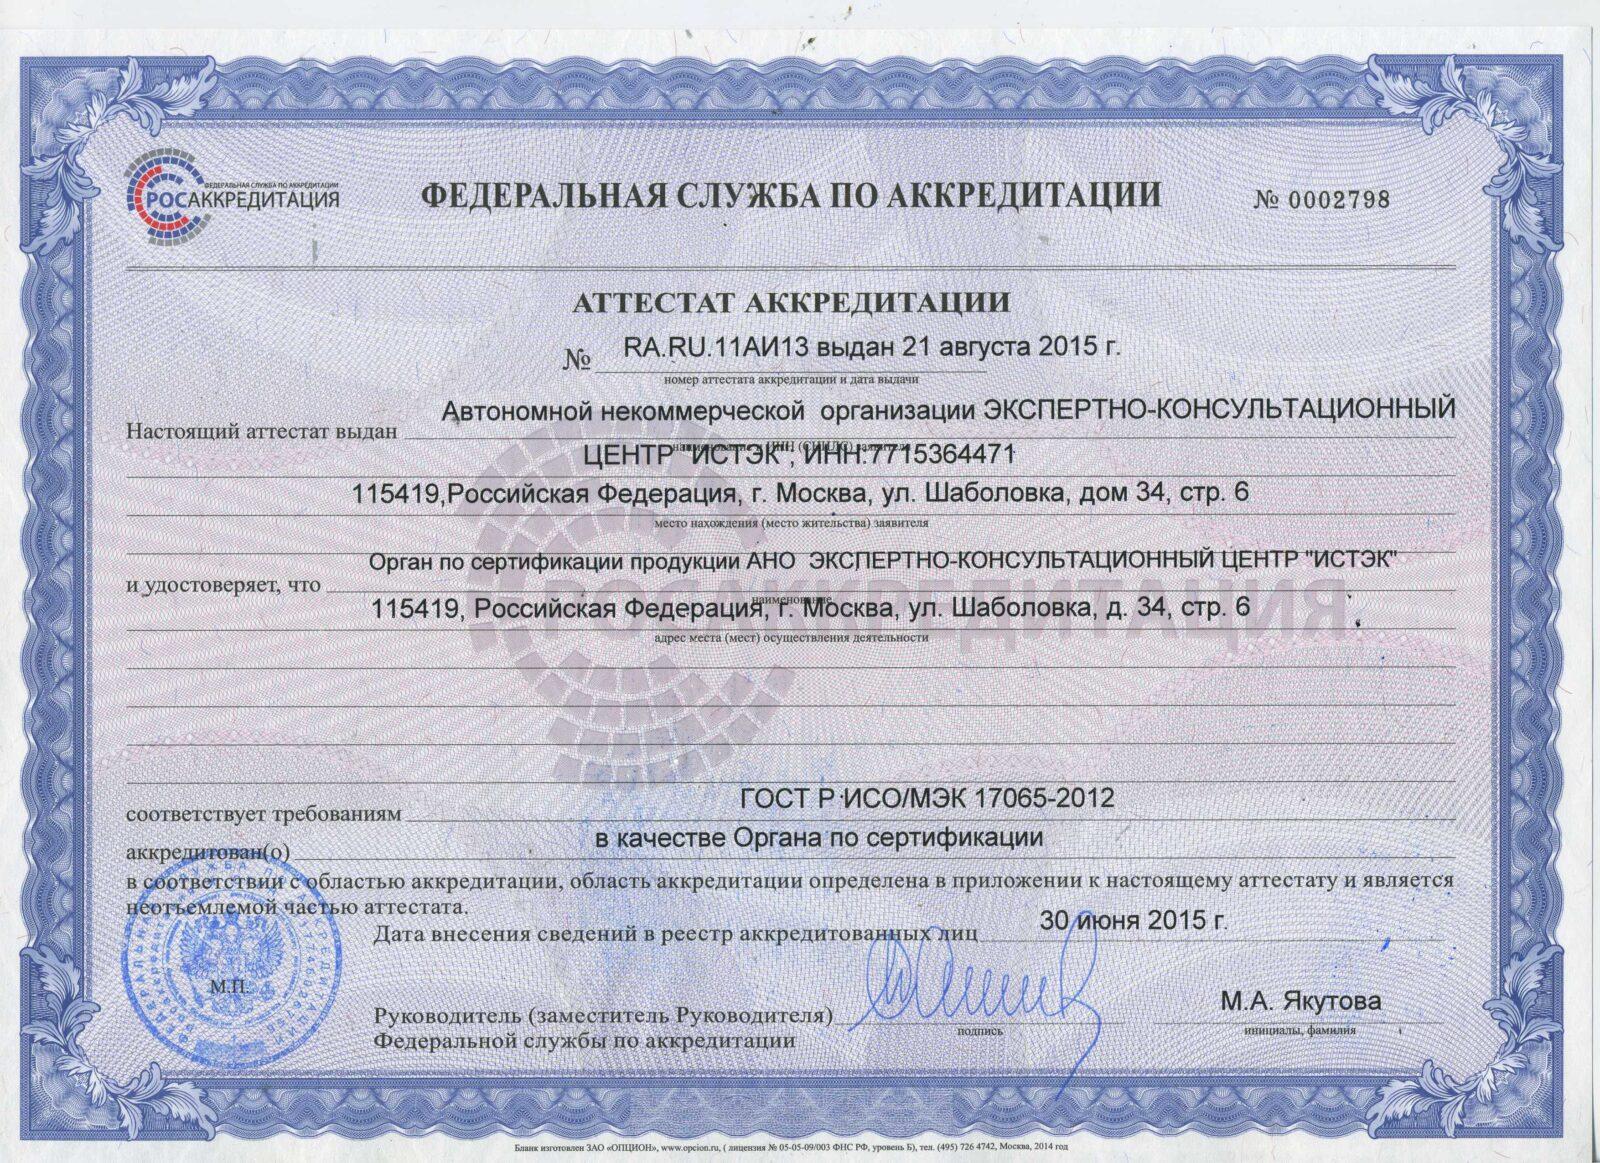 Аттестат аккредитации в качестве органа сертификации